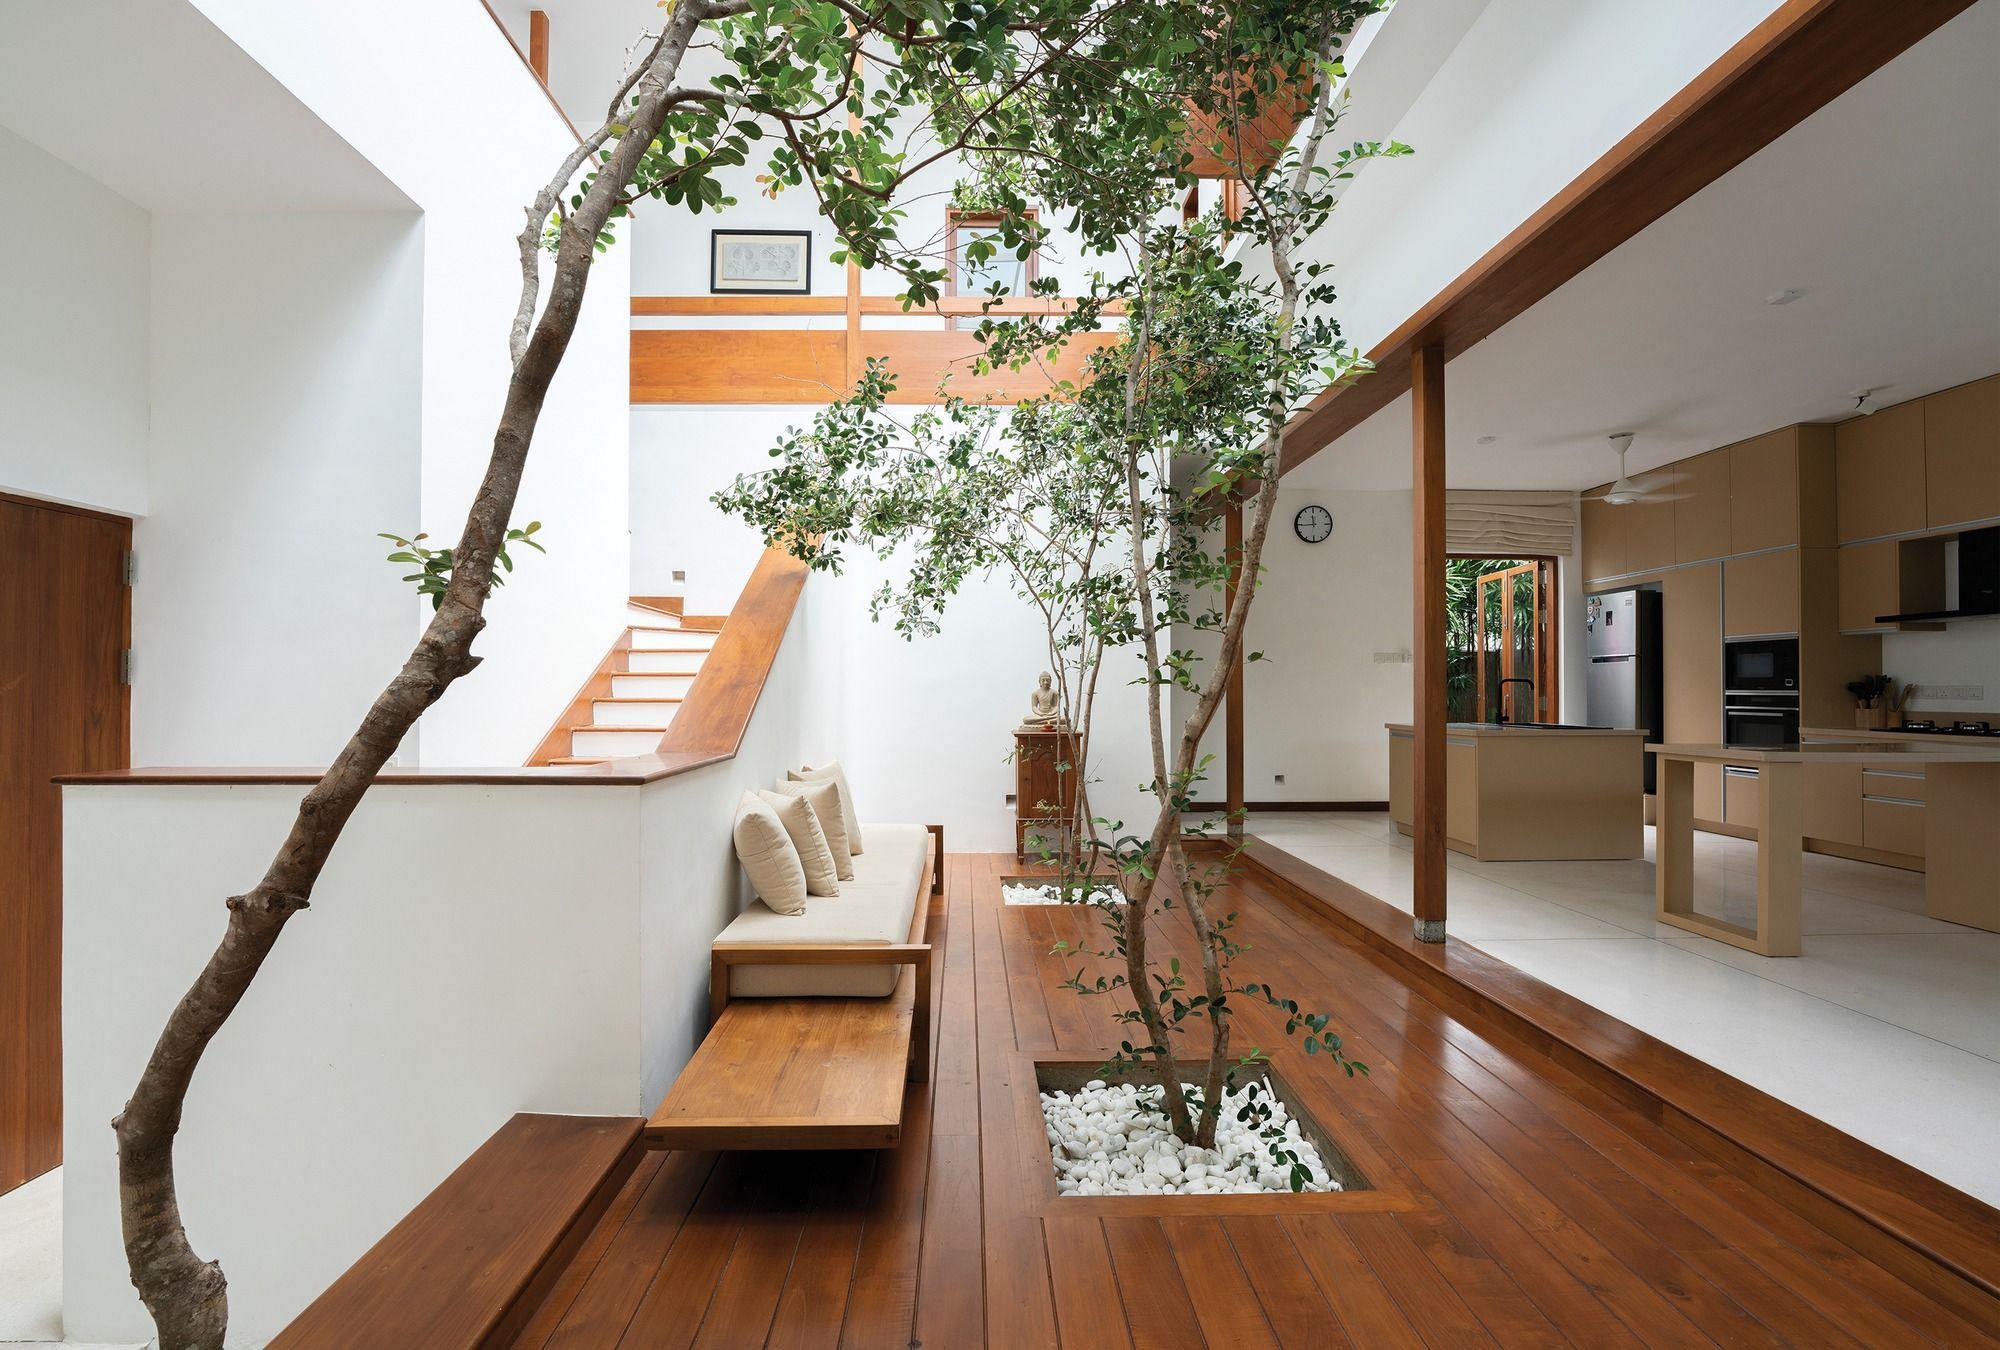 Open plan living spaces centered around a brightly lit indoor courtyard with trees Sri Jayawardenepura Kotte Sri Lanka [2000×1350]